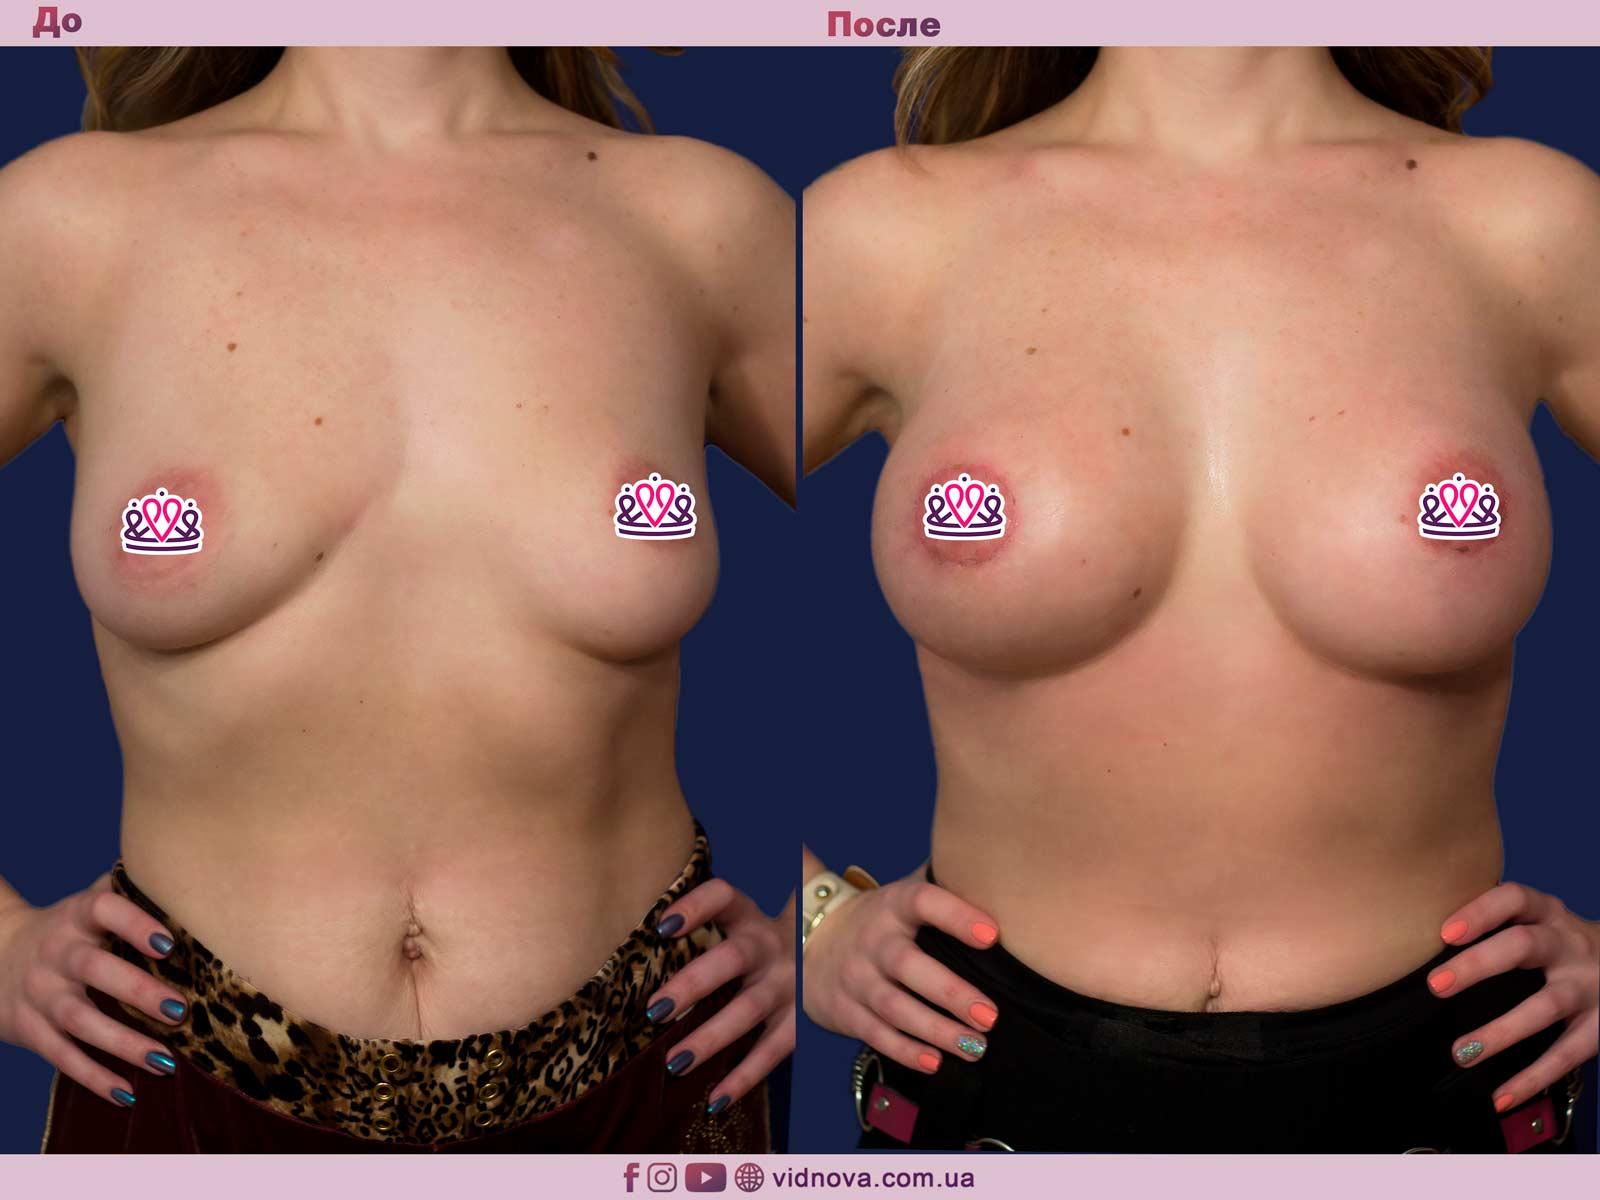 Увеличение груди: Фото ДО и ПОСЛЕ - Пример №77-1 - Клиника Vidnova